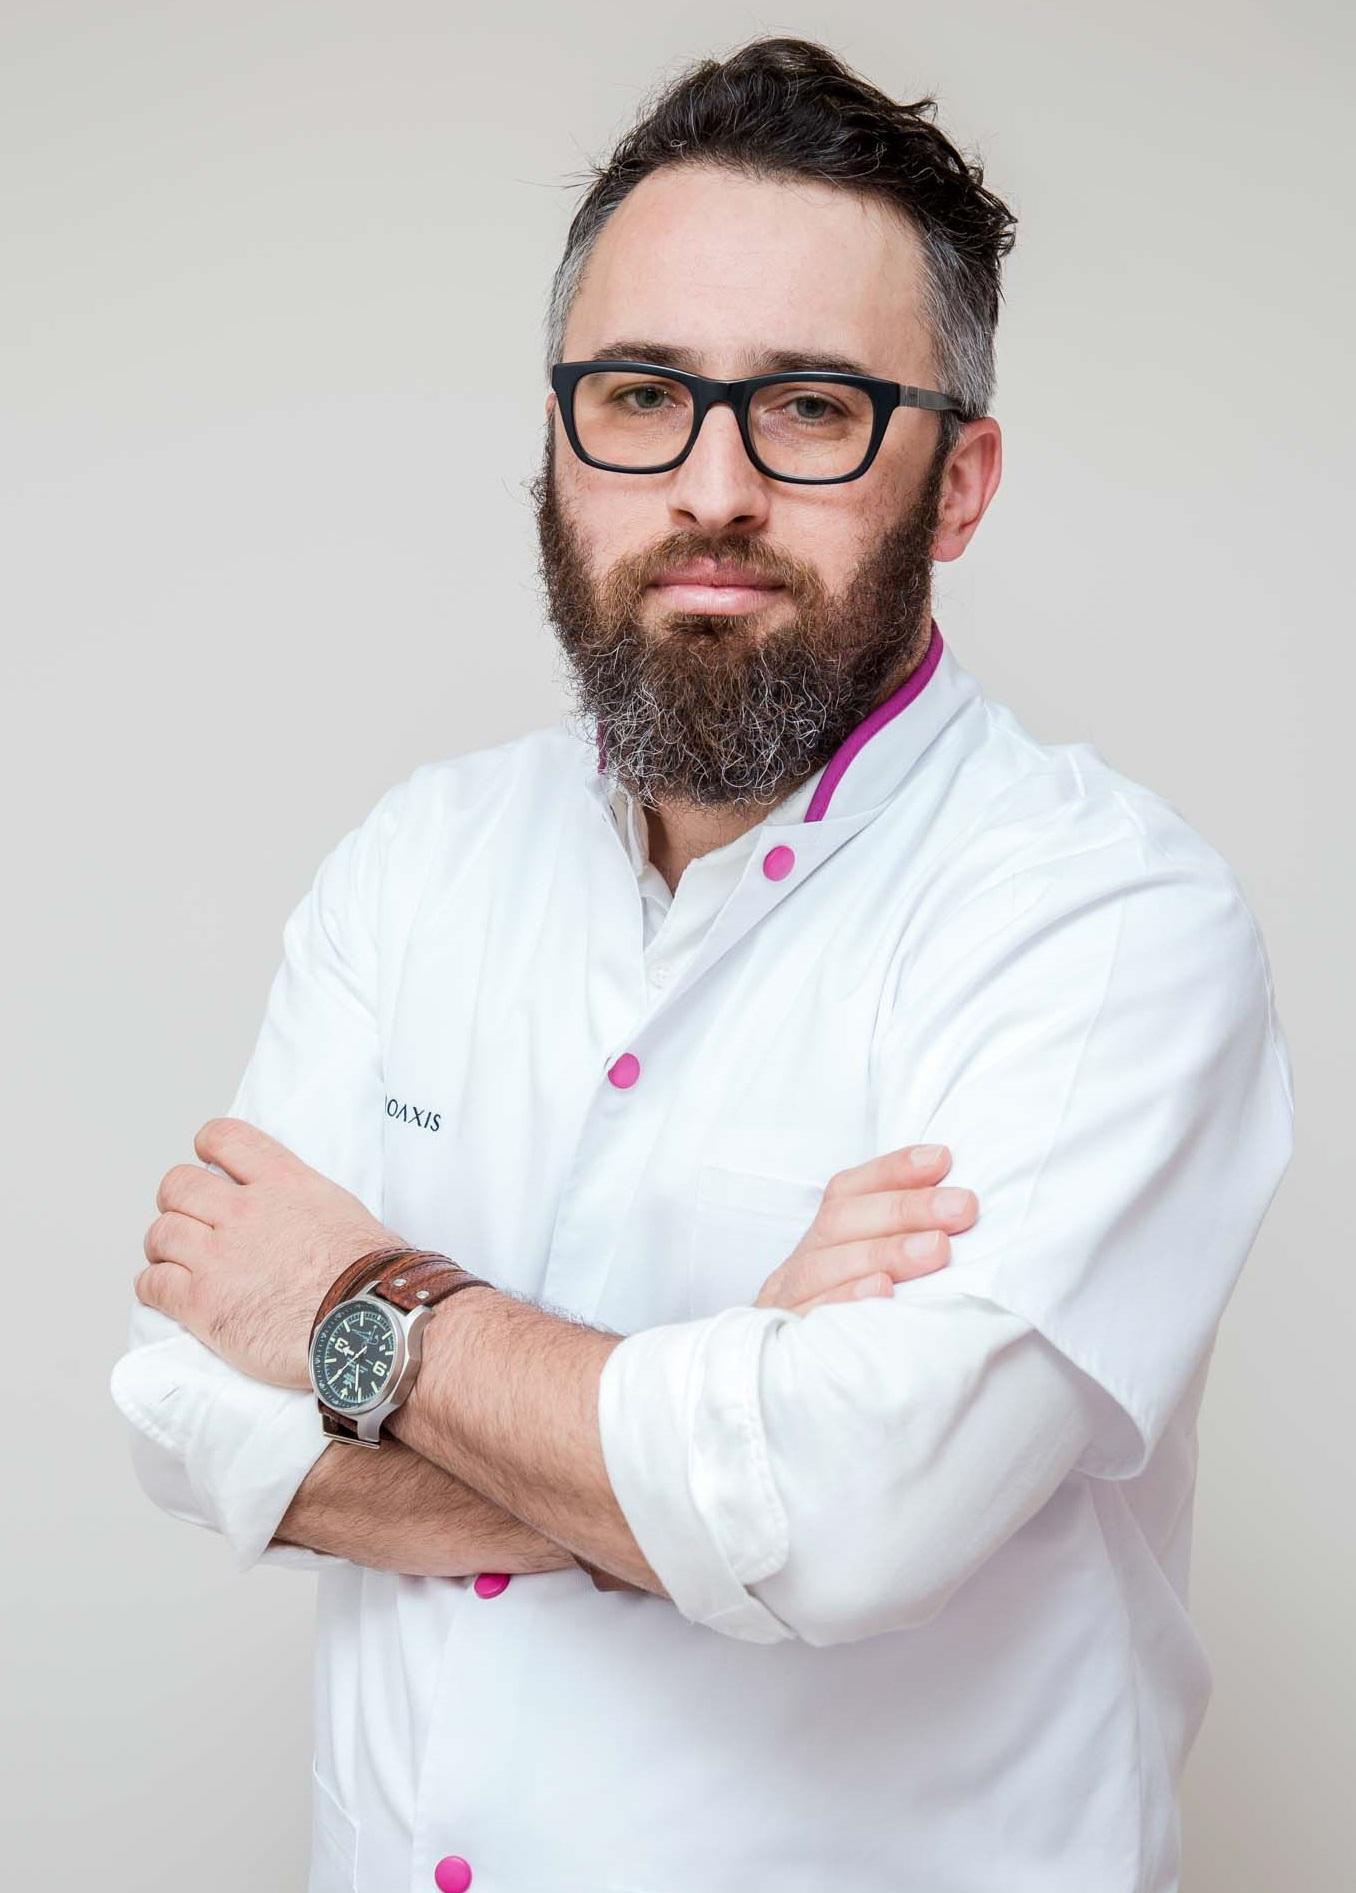 Dr. Paul Sorin Pletea